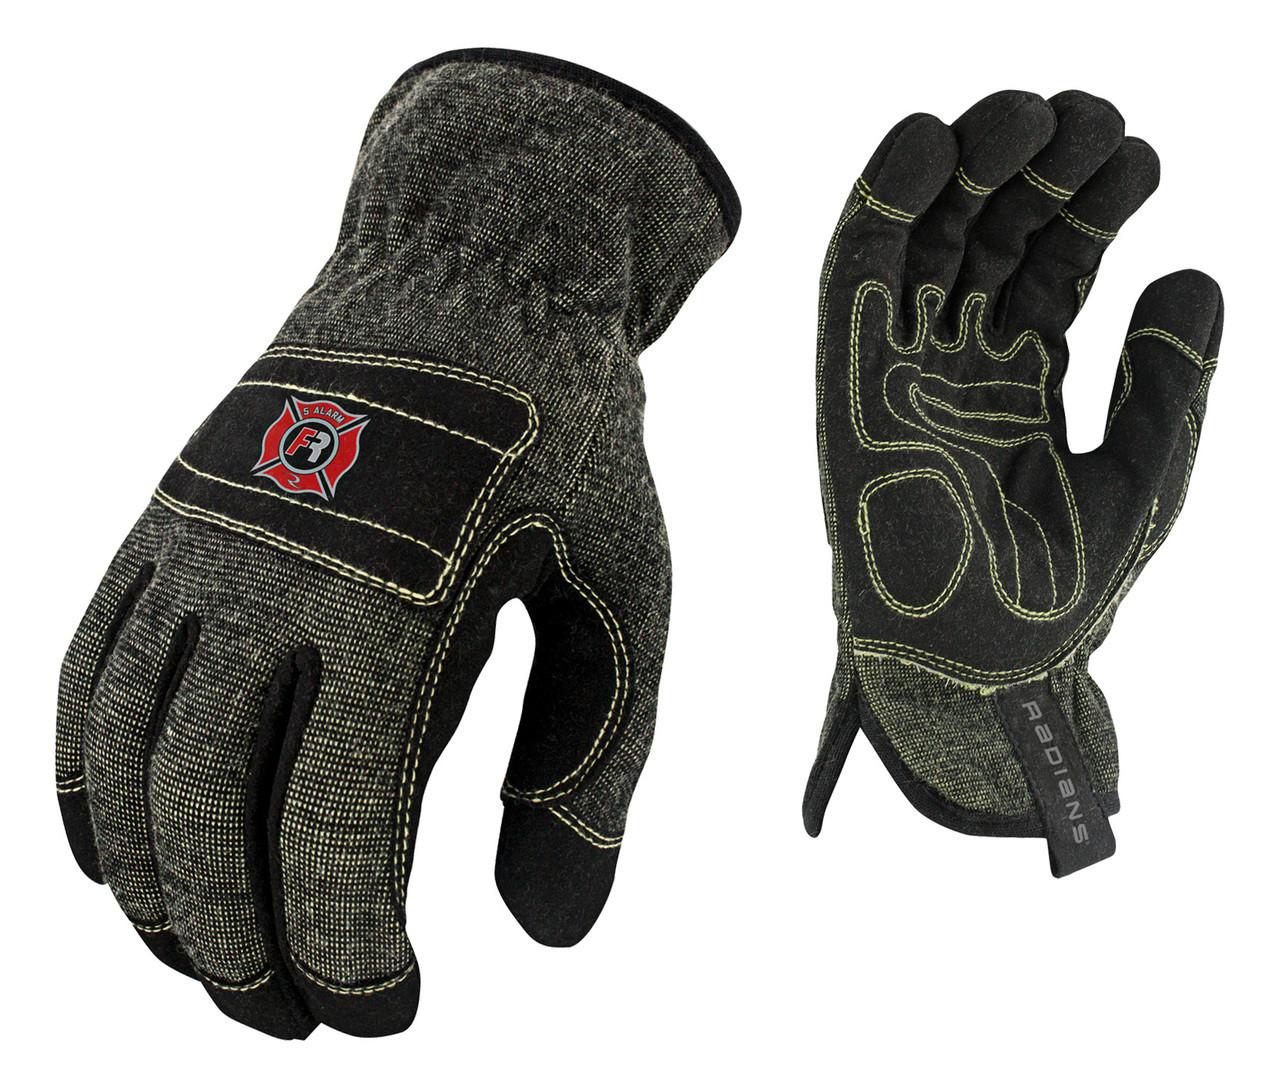 FR-RWG Work Glove